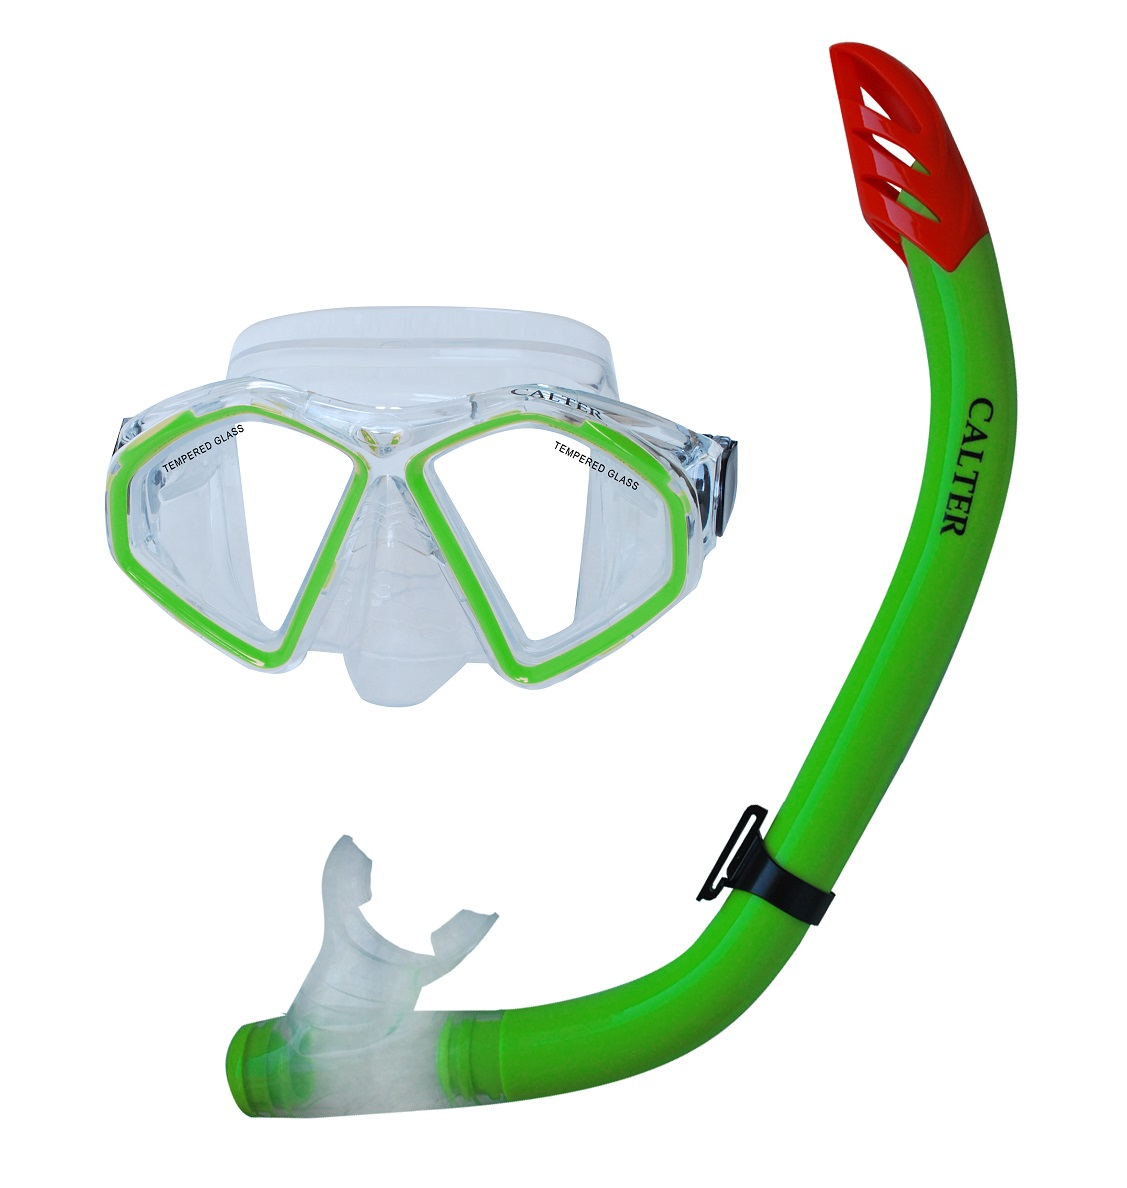 Potápěčský set CALTER SENIOR S09+M283 P+S, zelený